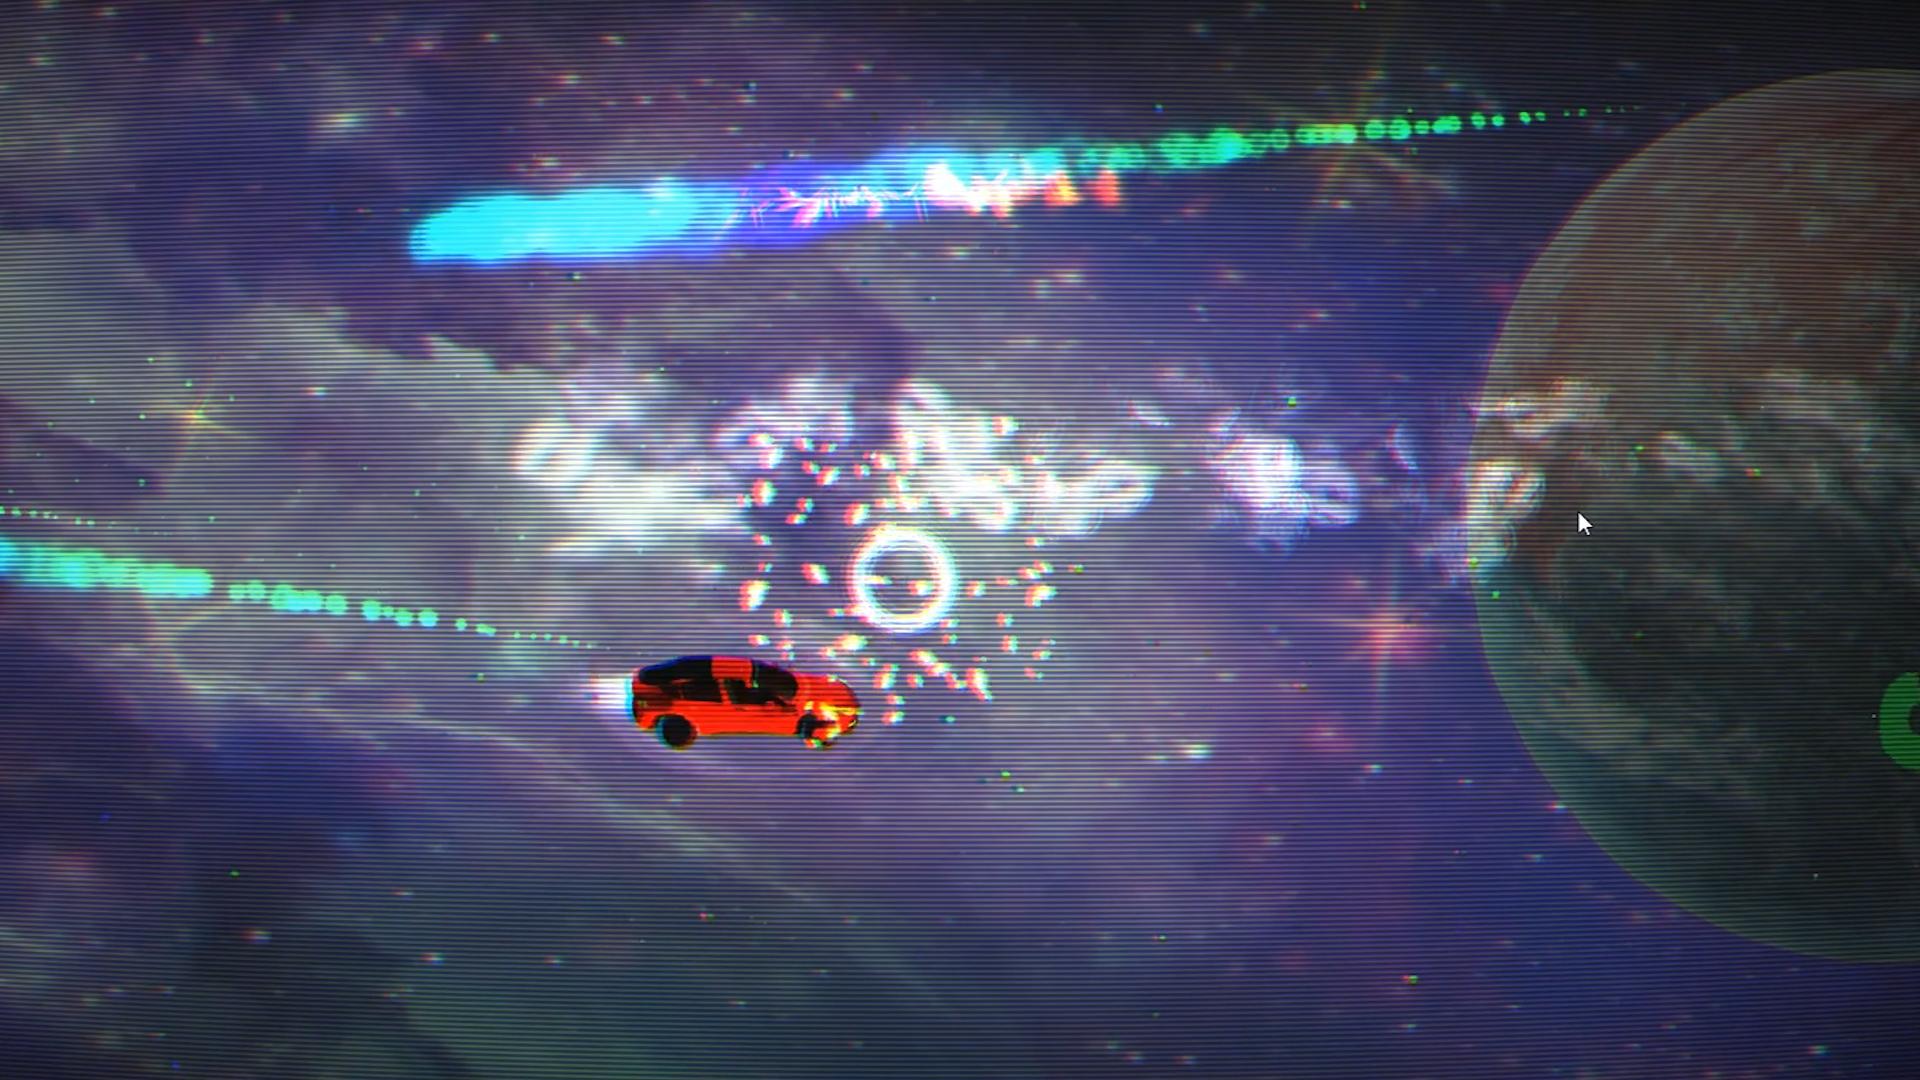 Tesla roadster going to mars screenshot